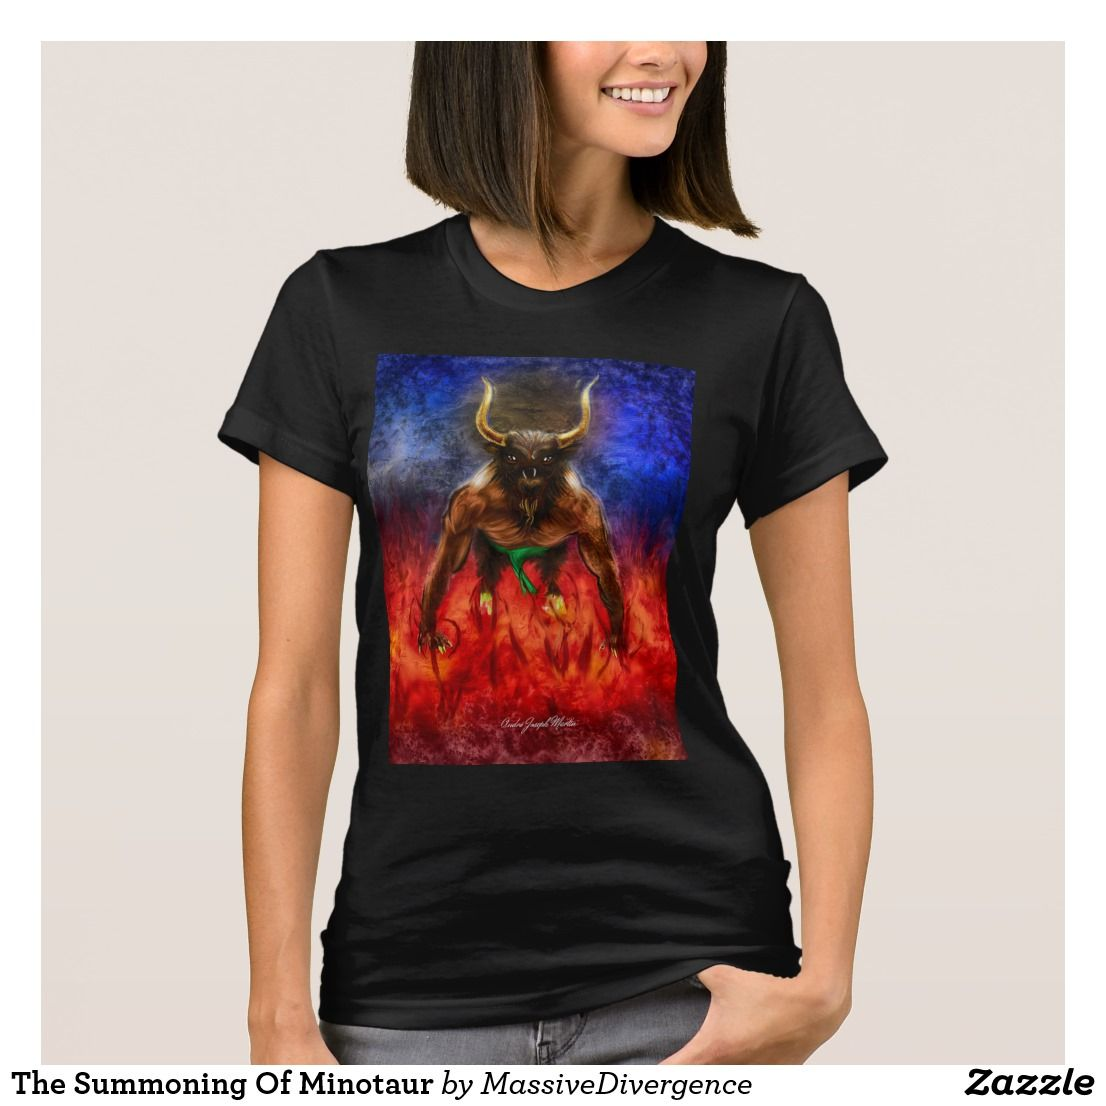 The Summoning Of Minotaur Shirts